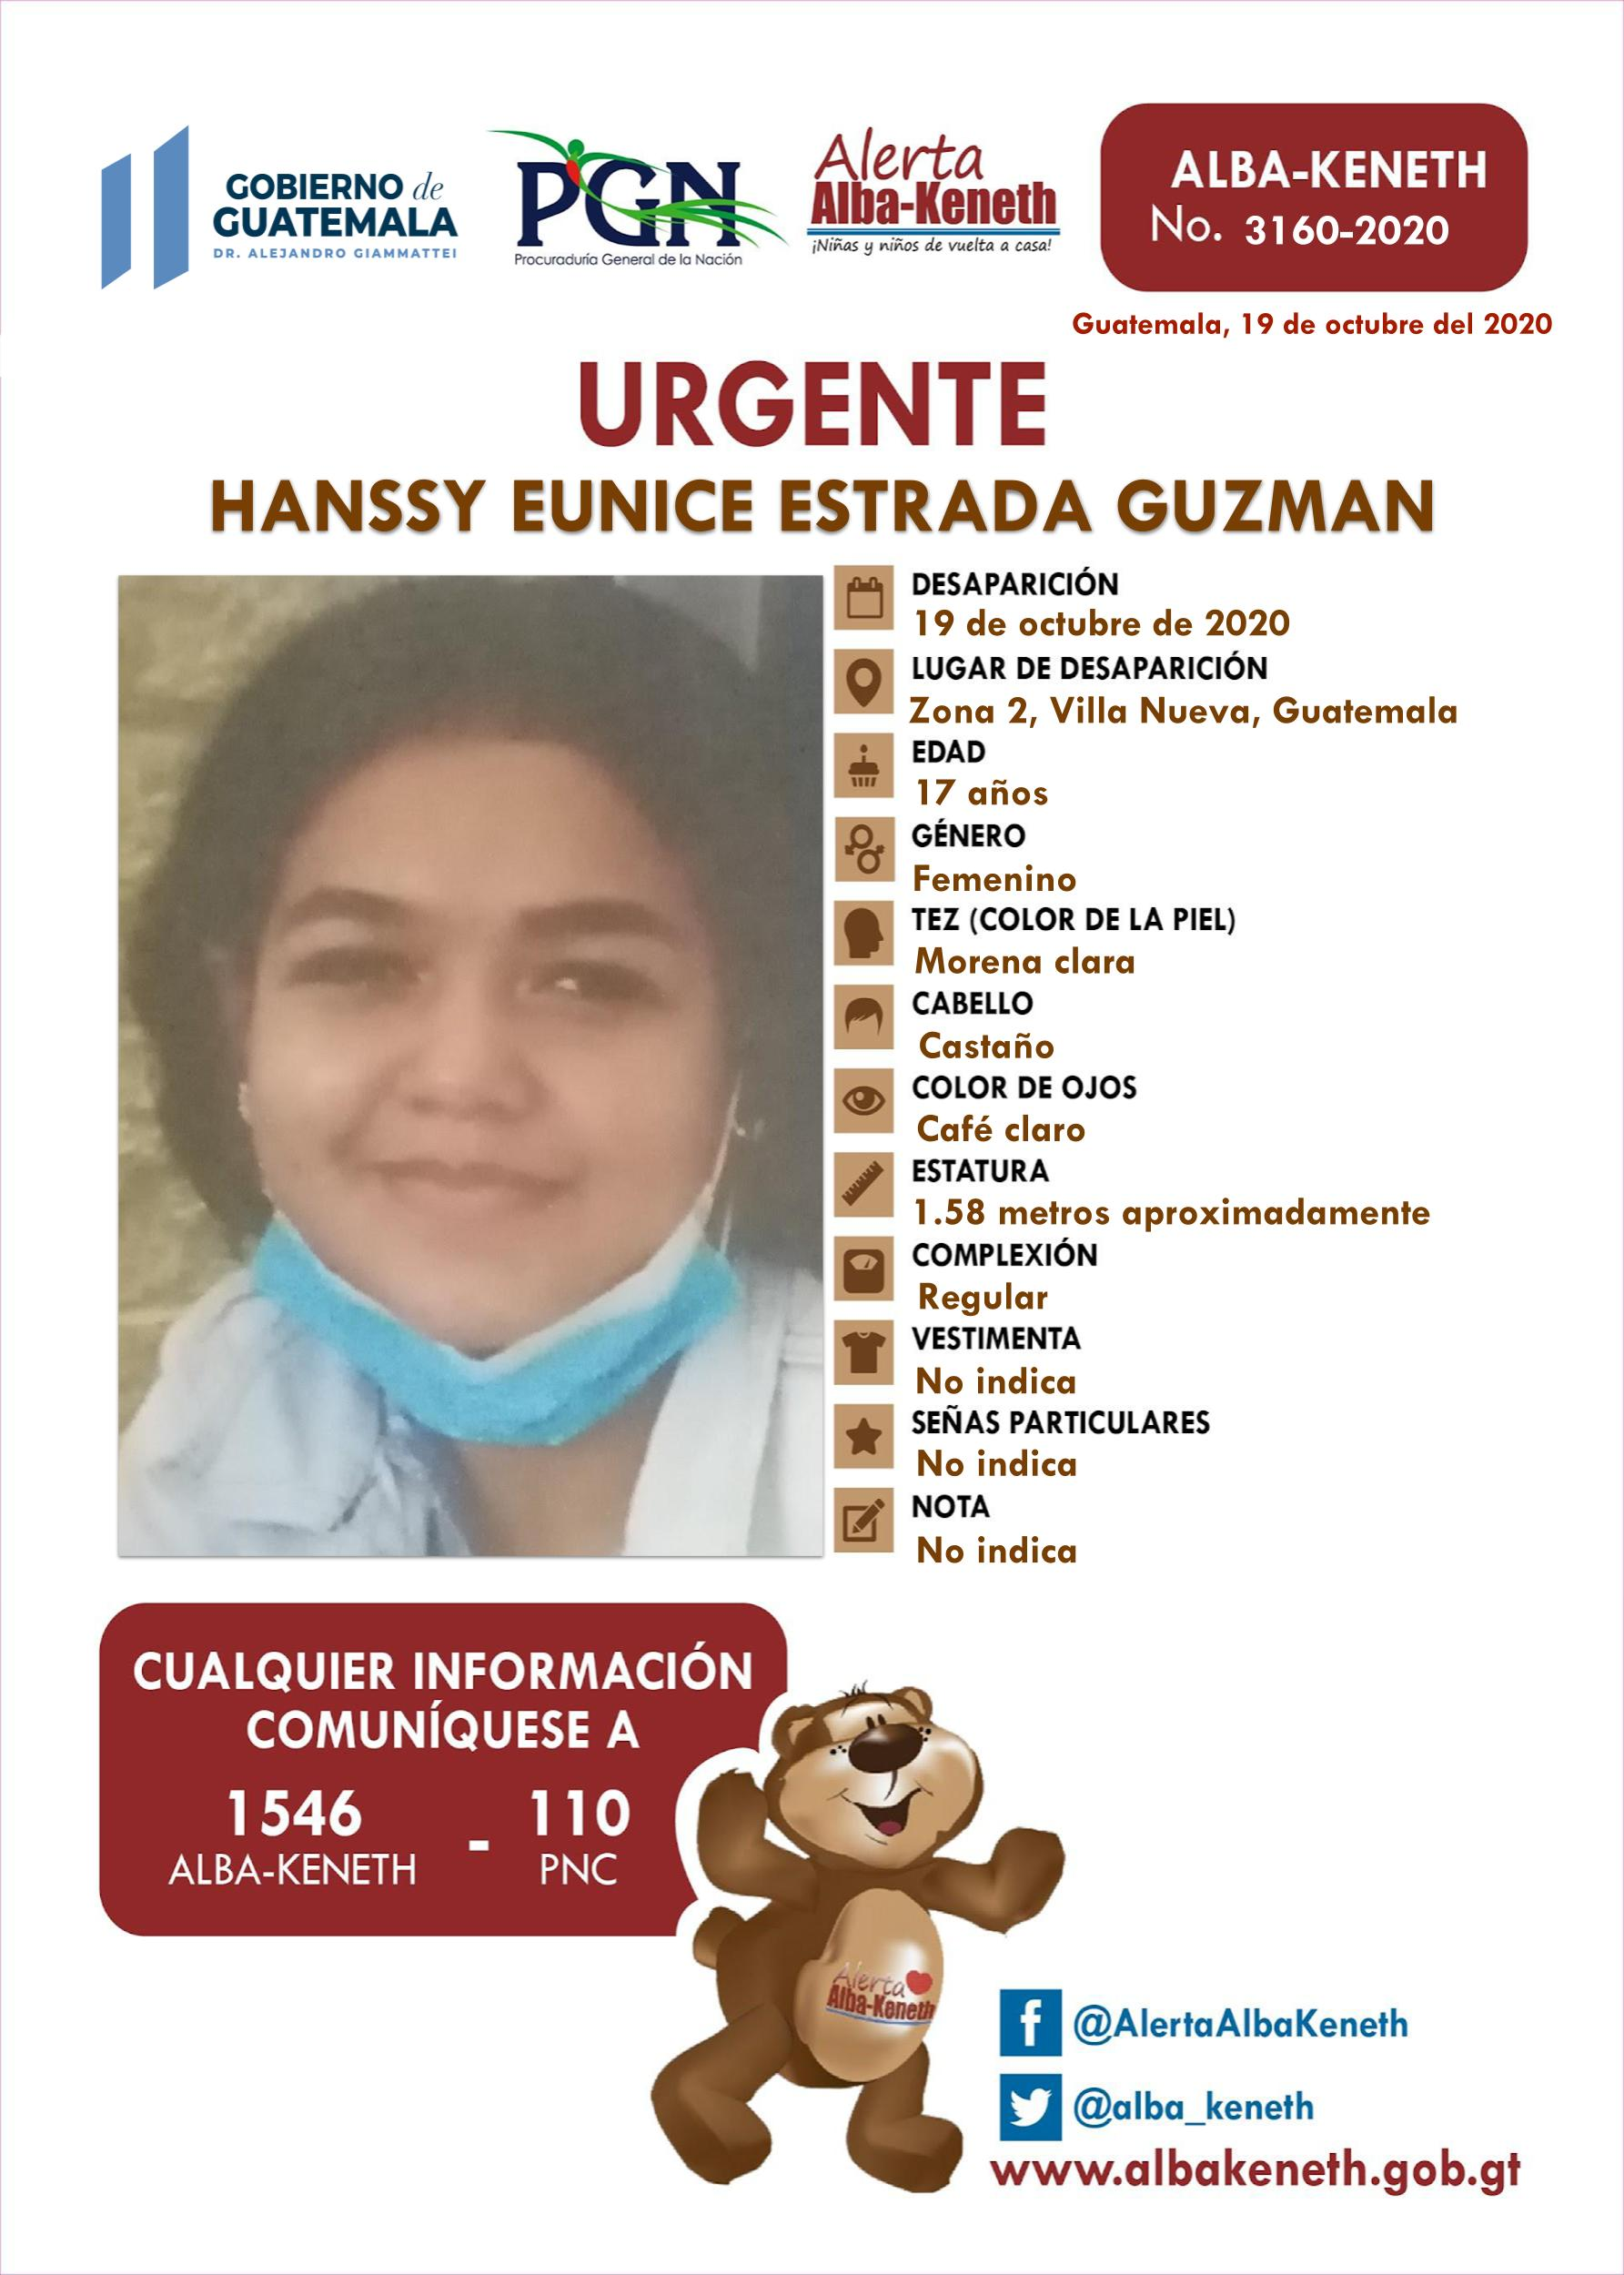 Hanssy Eunice Estrada Guzman